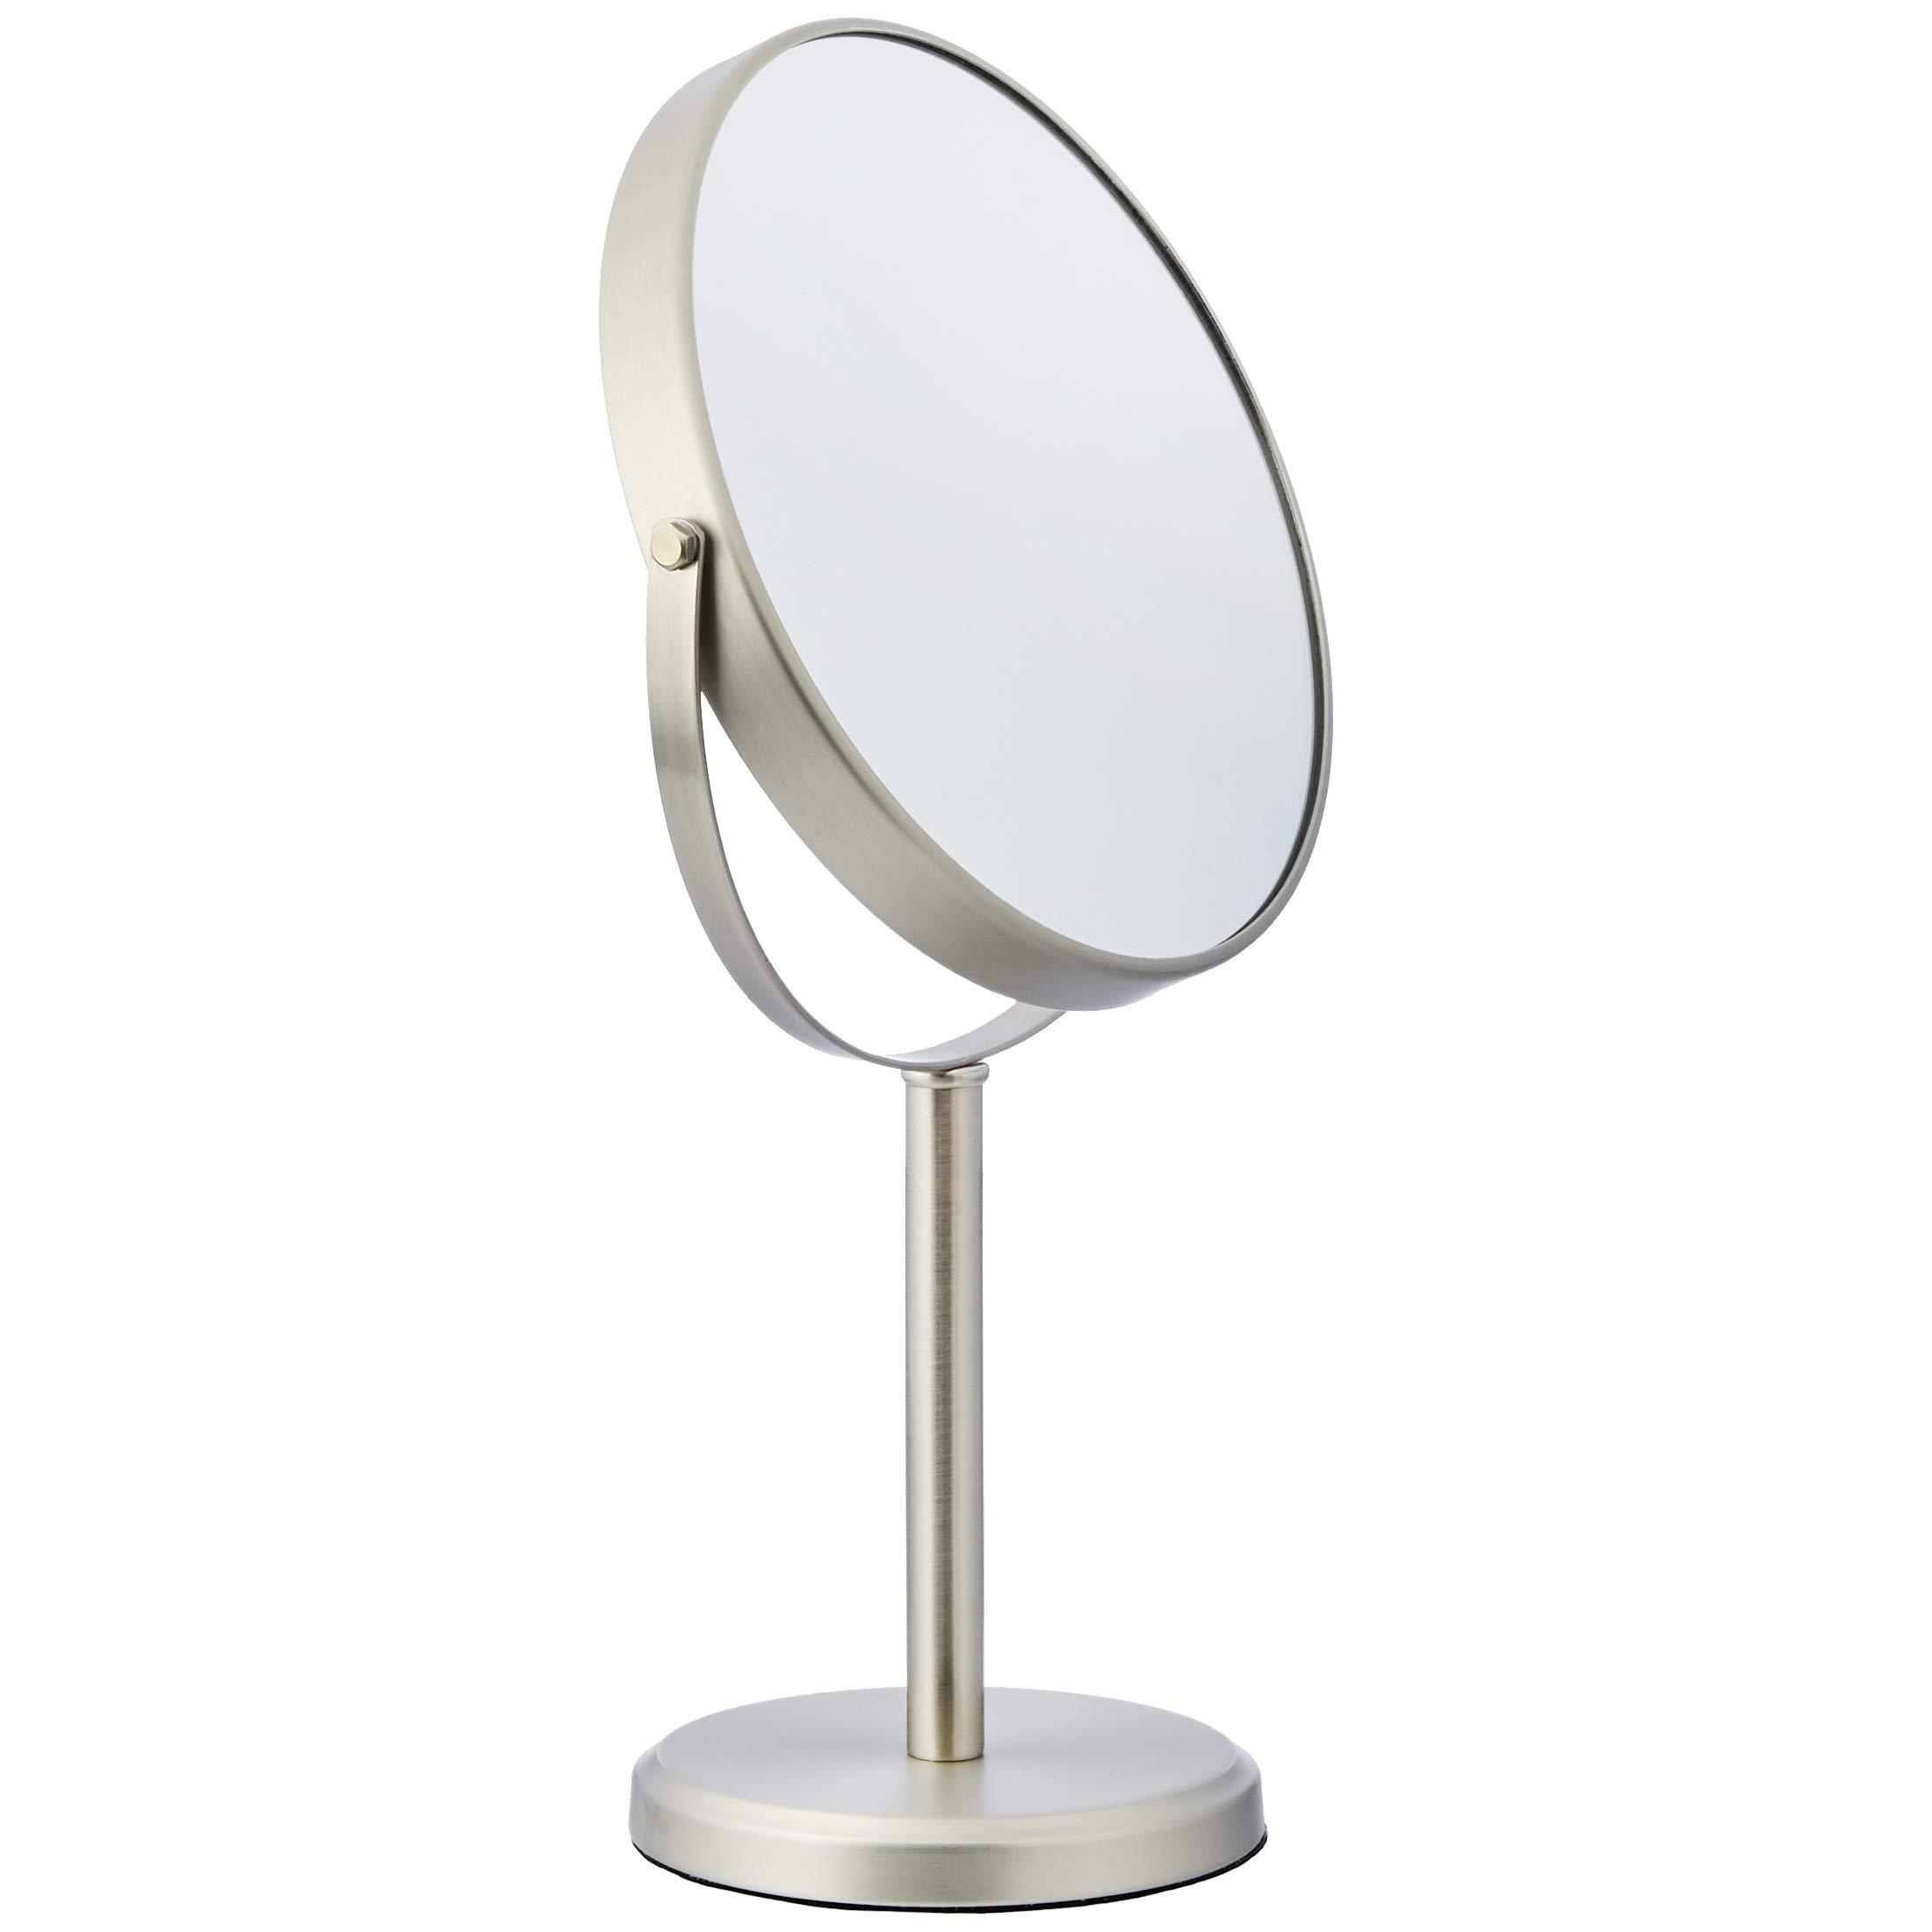 AmazonBasics Modern Dual Sided Magnification Makeup Vanity Mirror, Tall, Nickel